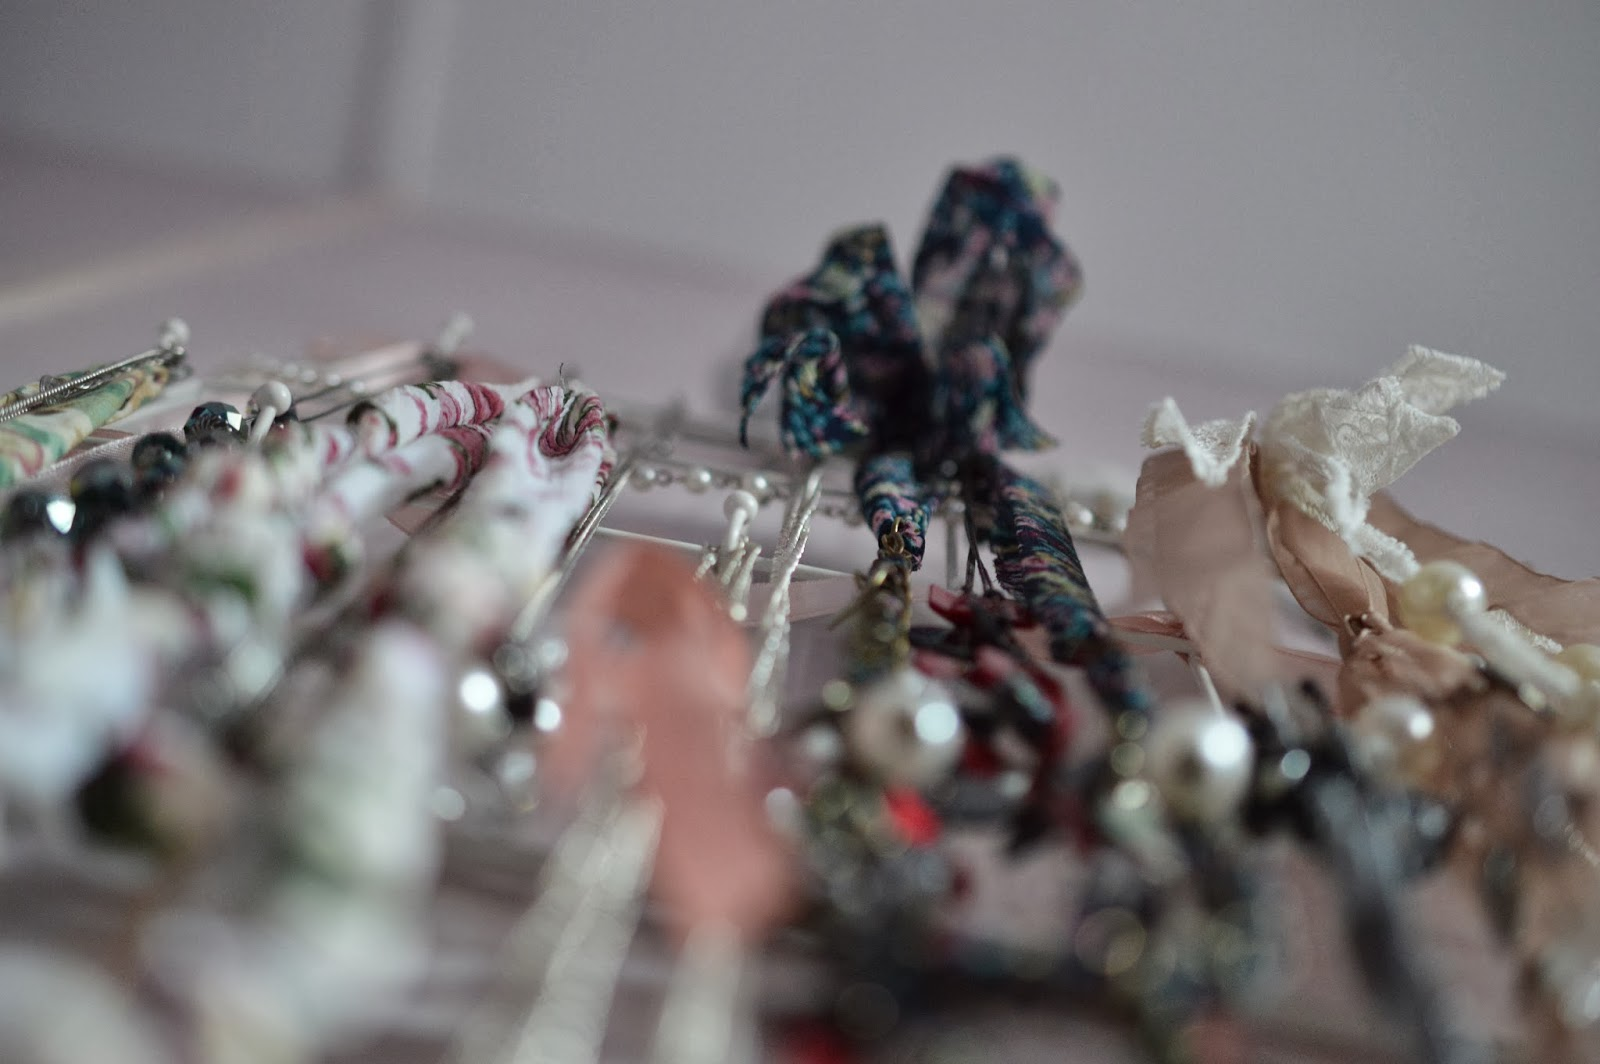 priscillad brouille nettoyer ses bijoux. Black Bedroom Furniture Sets. Home Design Ideas